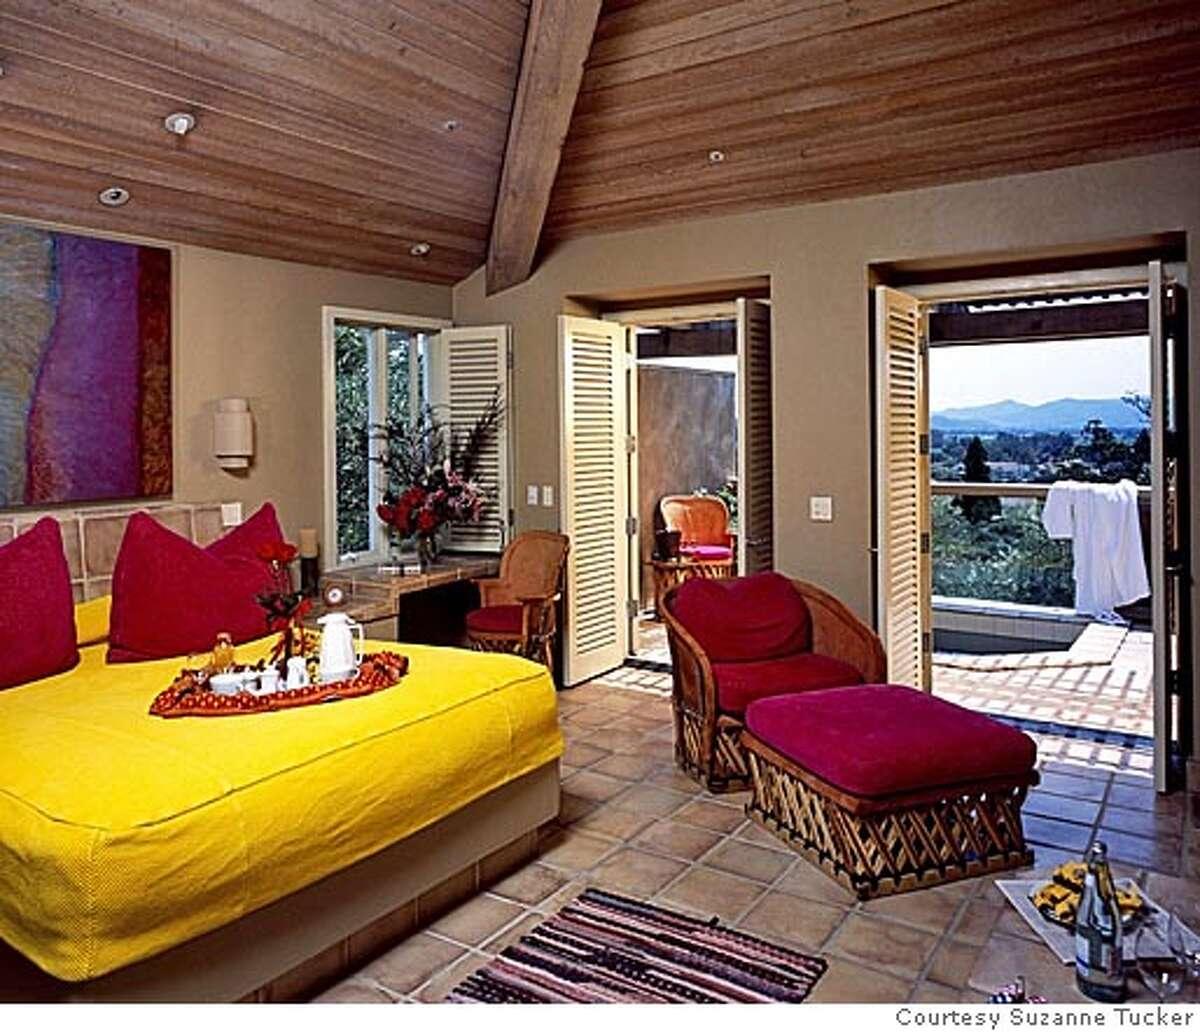 Auberge du Soleil guest cottage, before Courtesy Suzanne Tucker